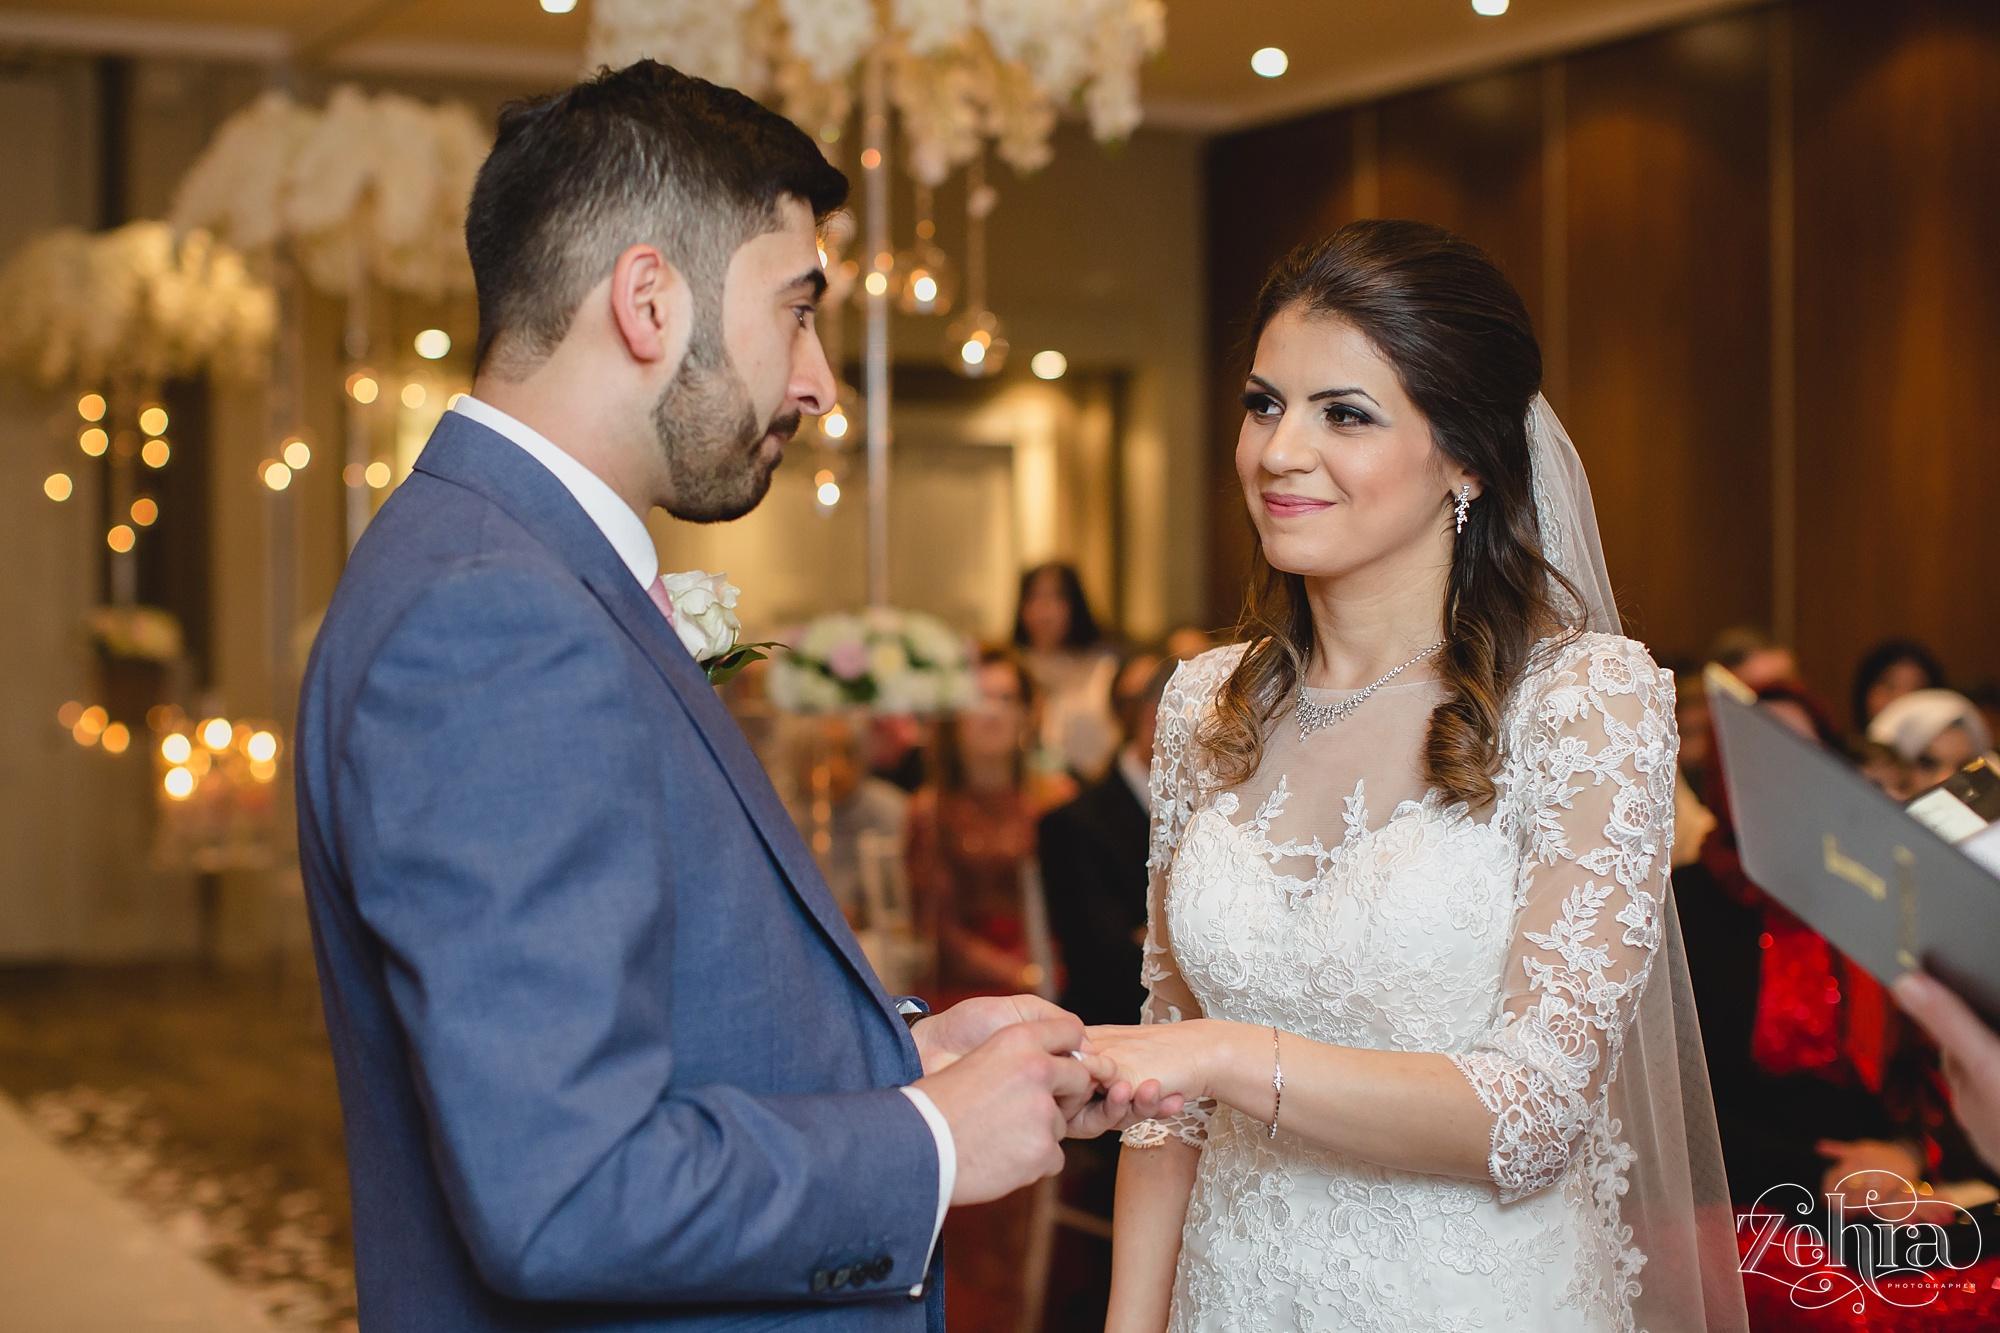 zehra photographer mere cheshire wedding_0013.jpg